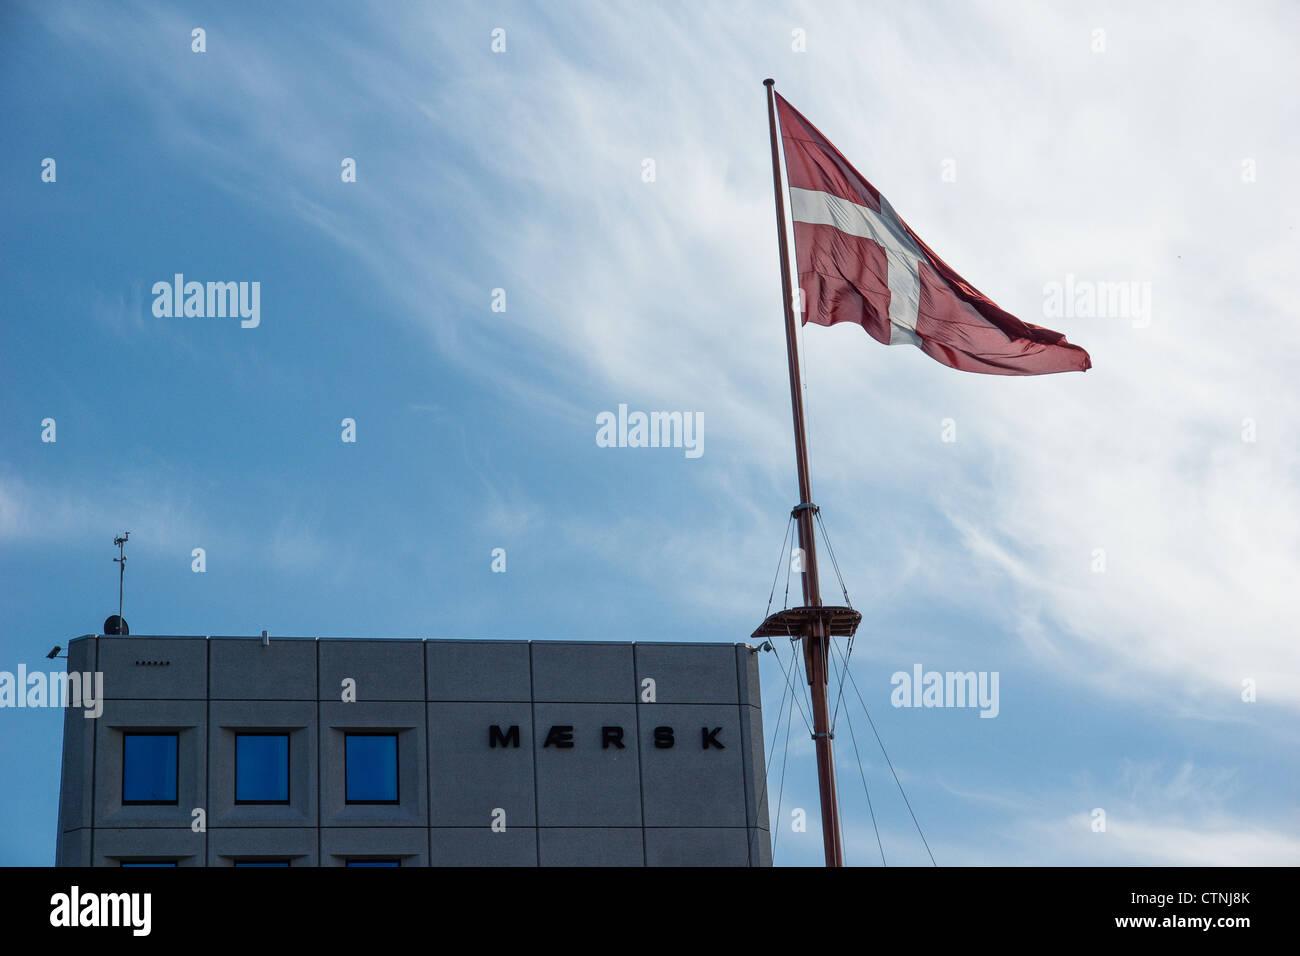 Maersk headquarter in Copenhagen - Stock Image